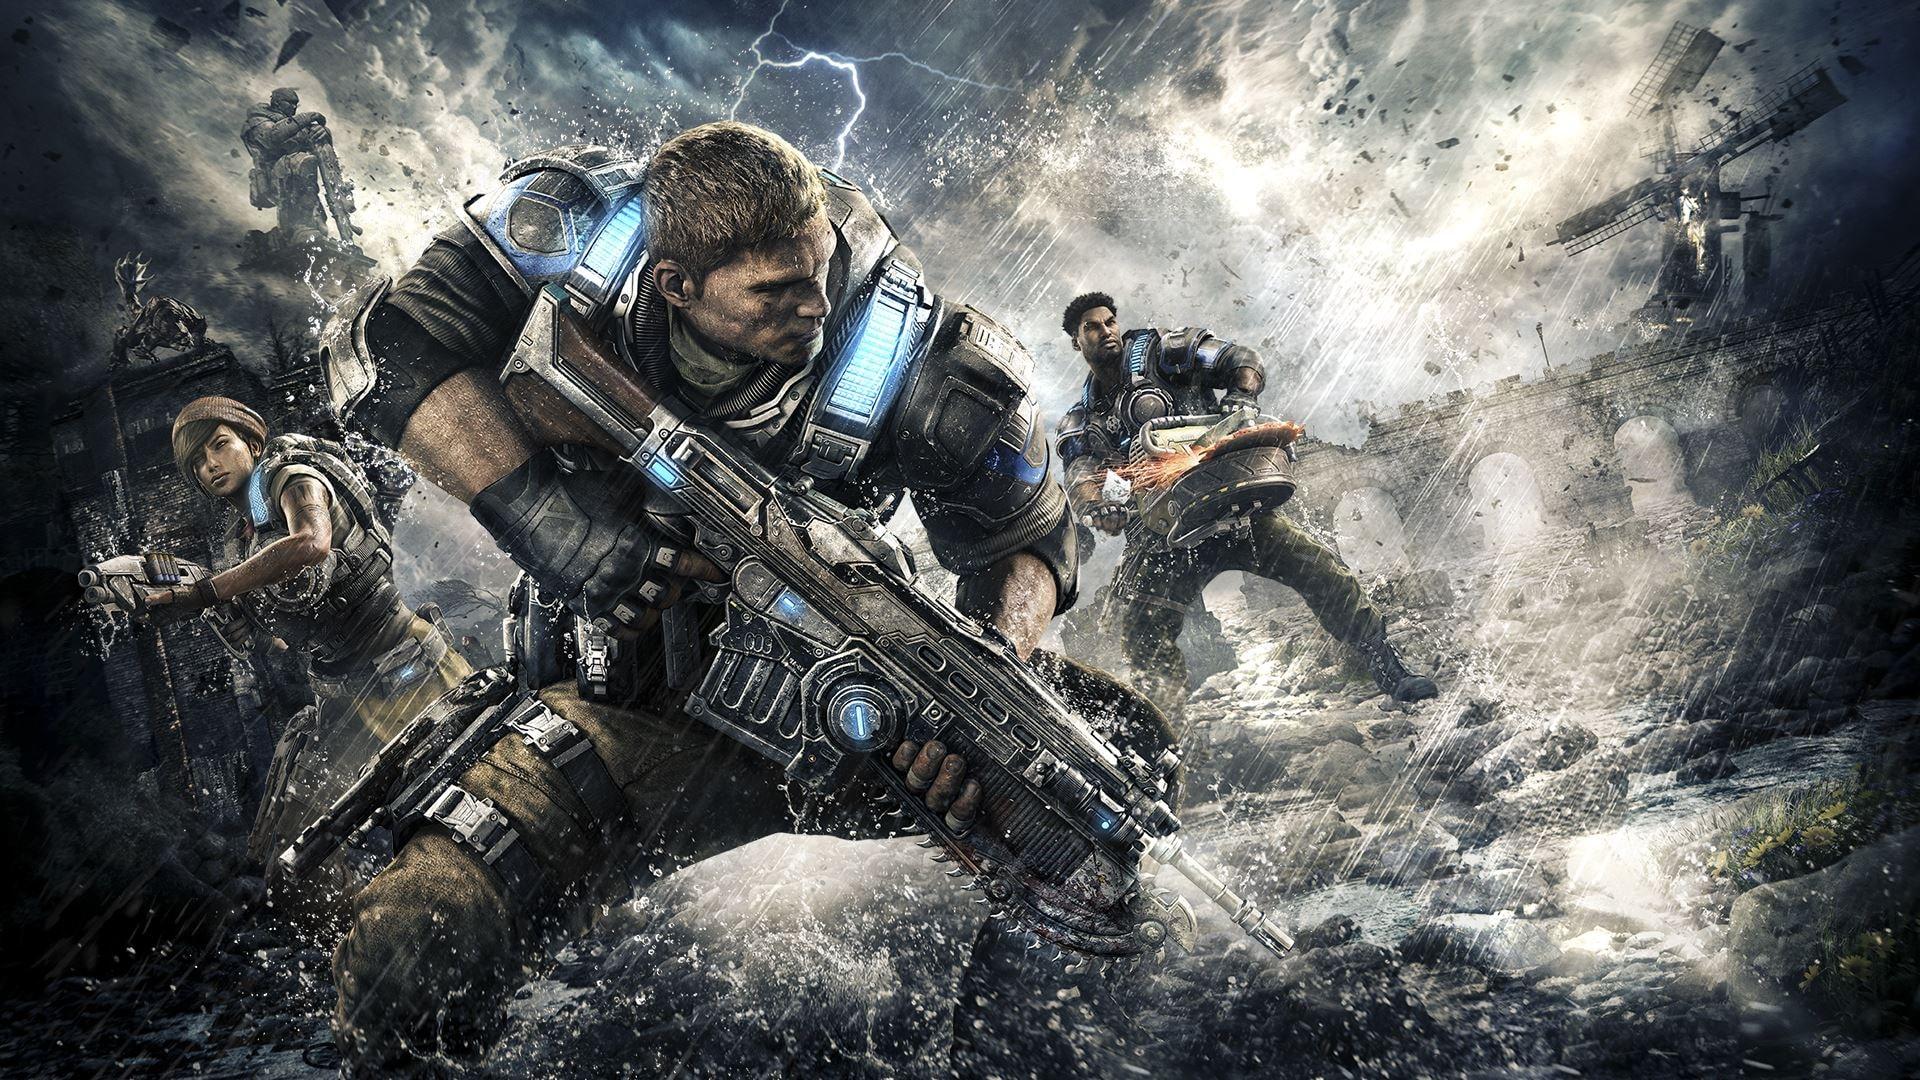 Gears of War 4 (Xbox One, Windows 10) - Xbox Live Key - GLOBAL - 4